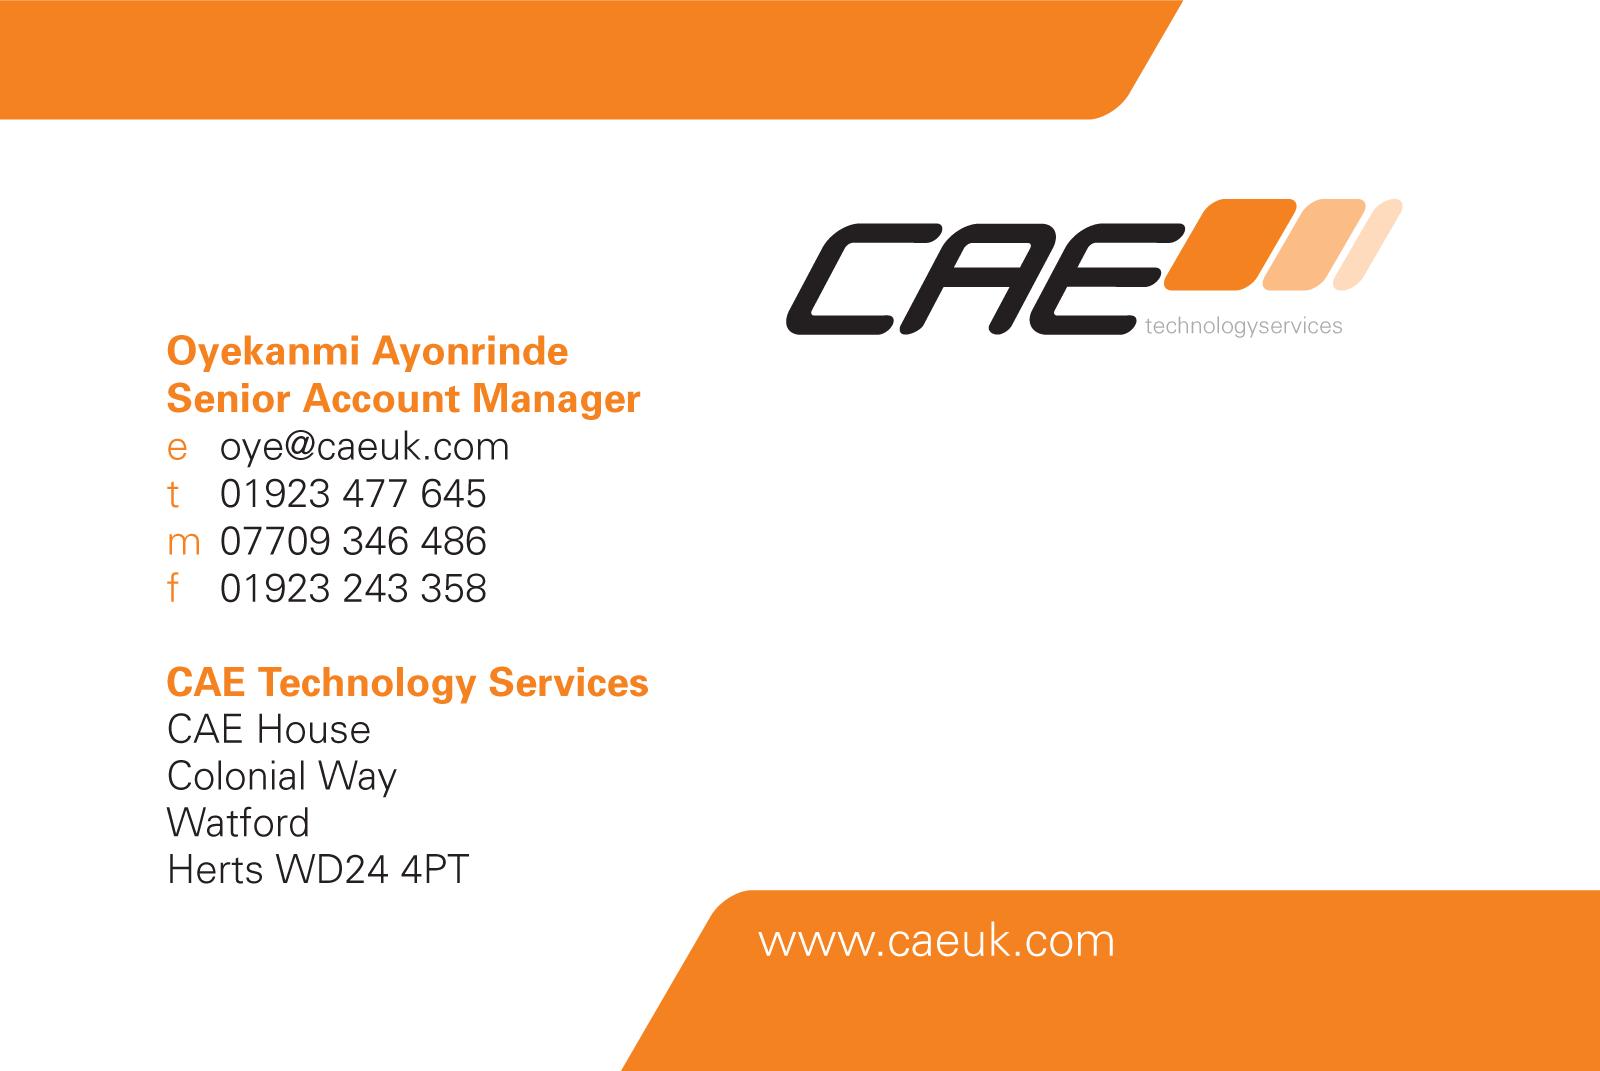 cae - business card